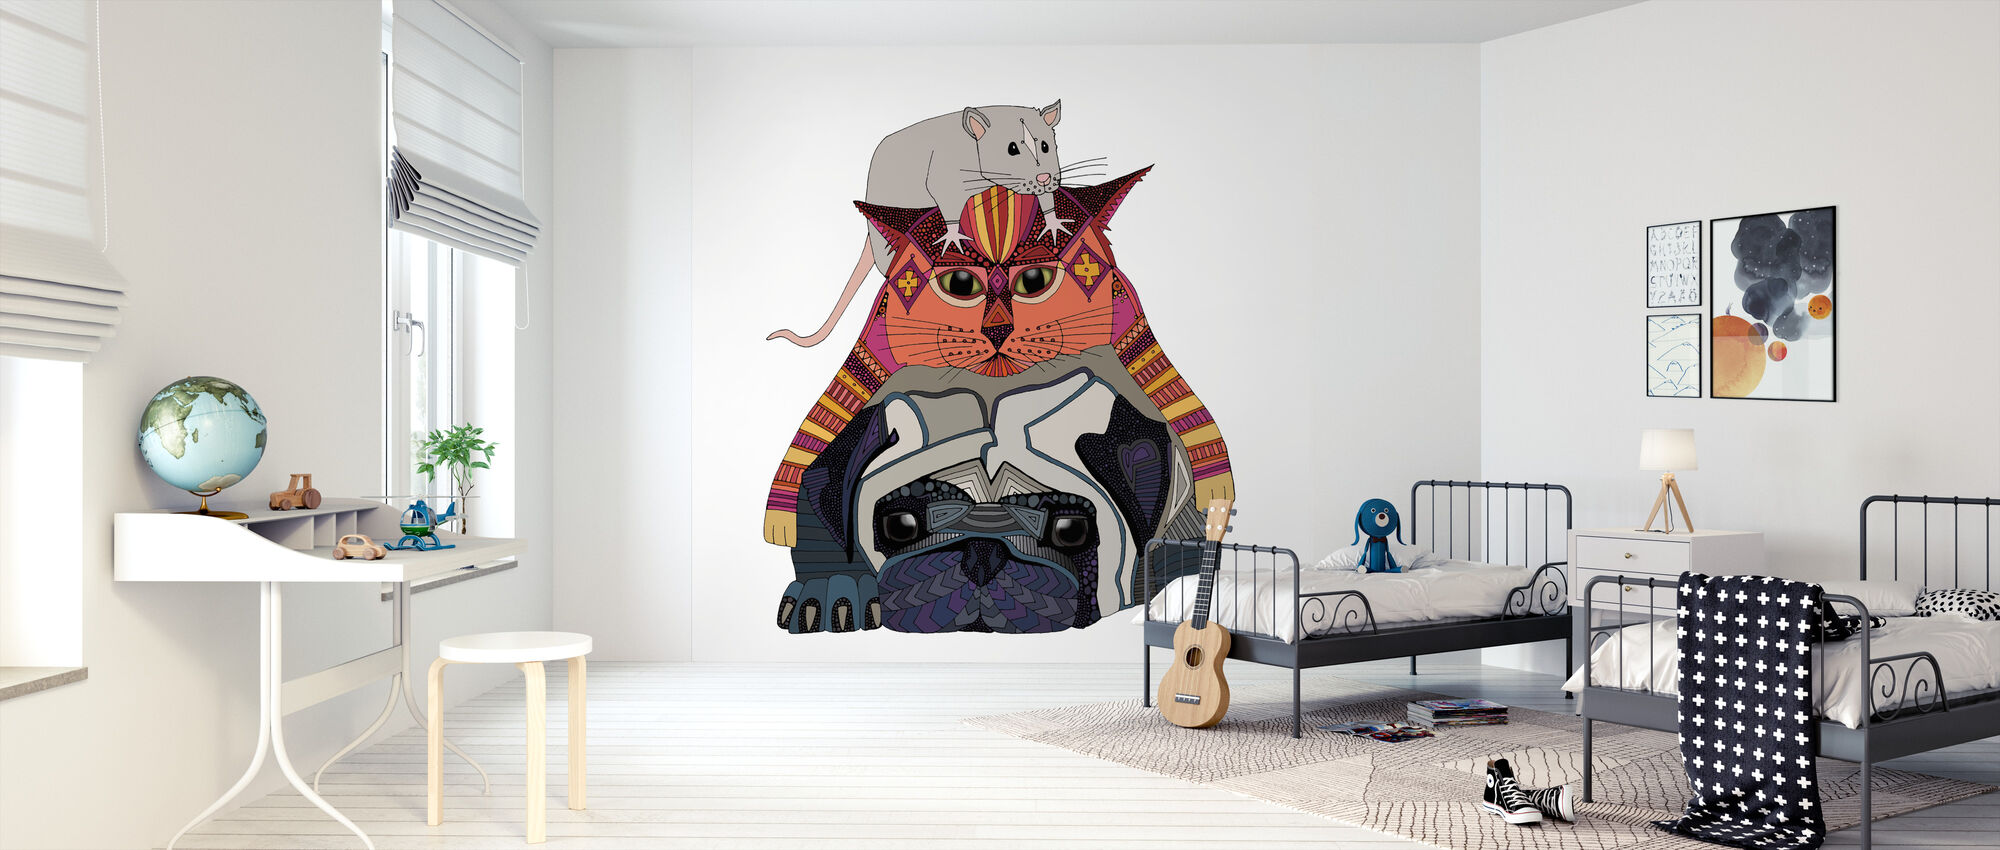 Hiiri ja kissa ja Mopsi - Tapetti - Lastenhuone